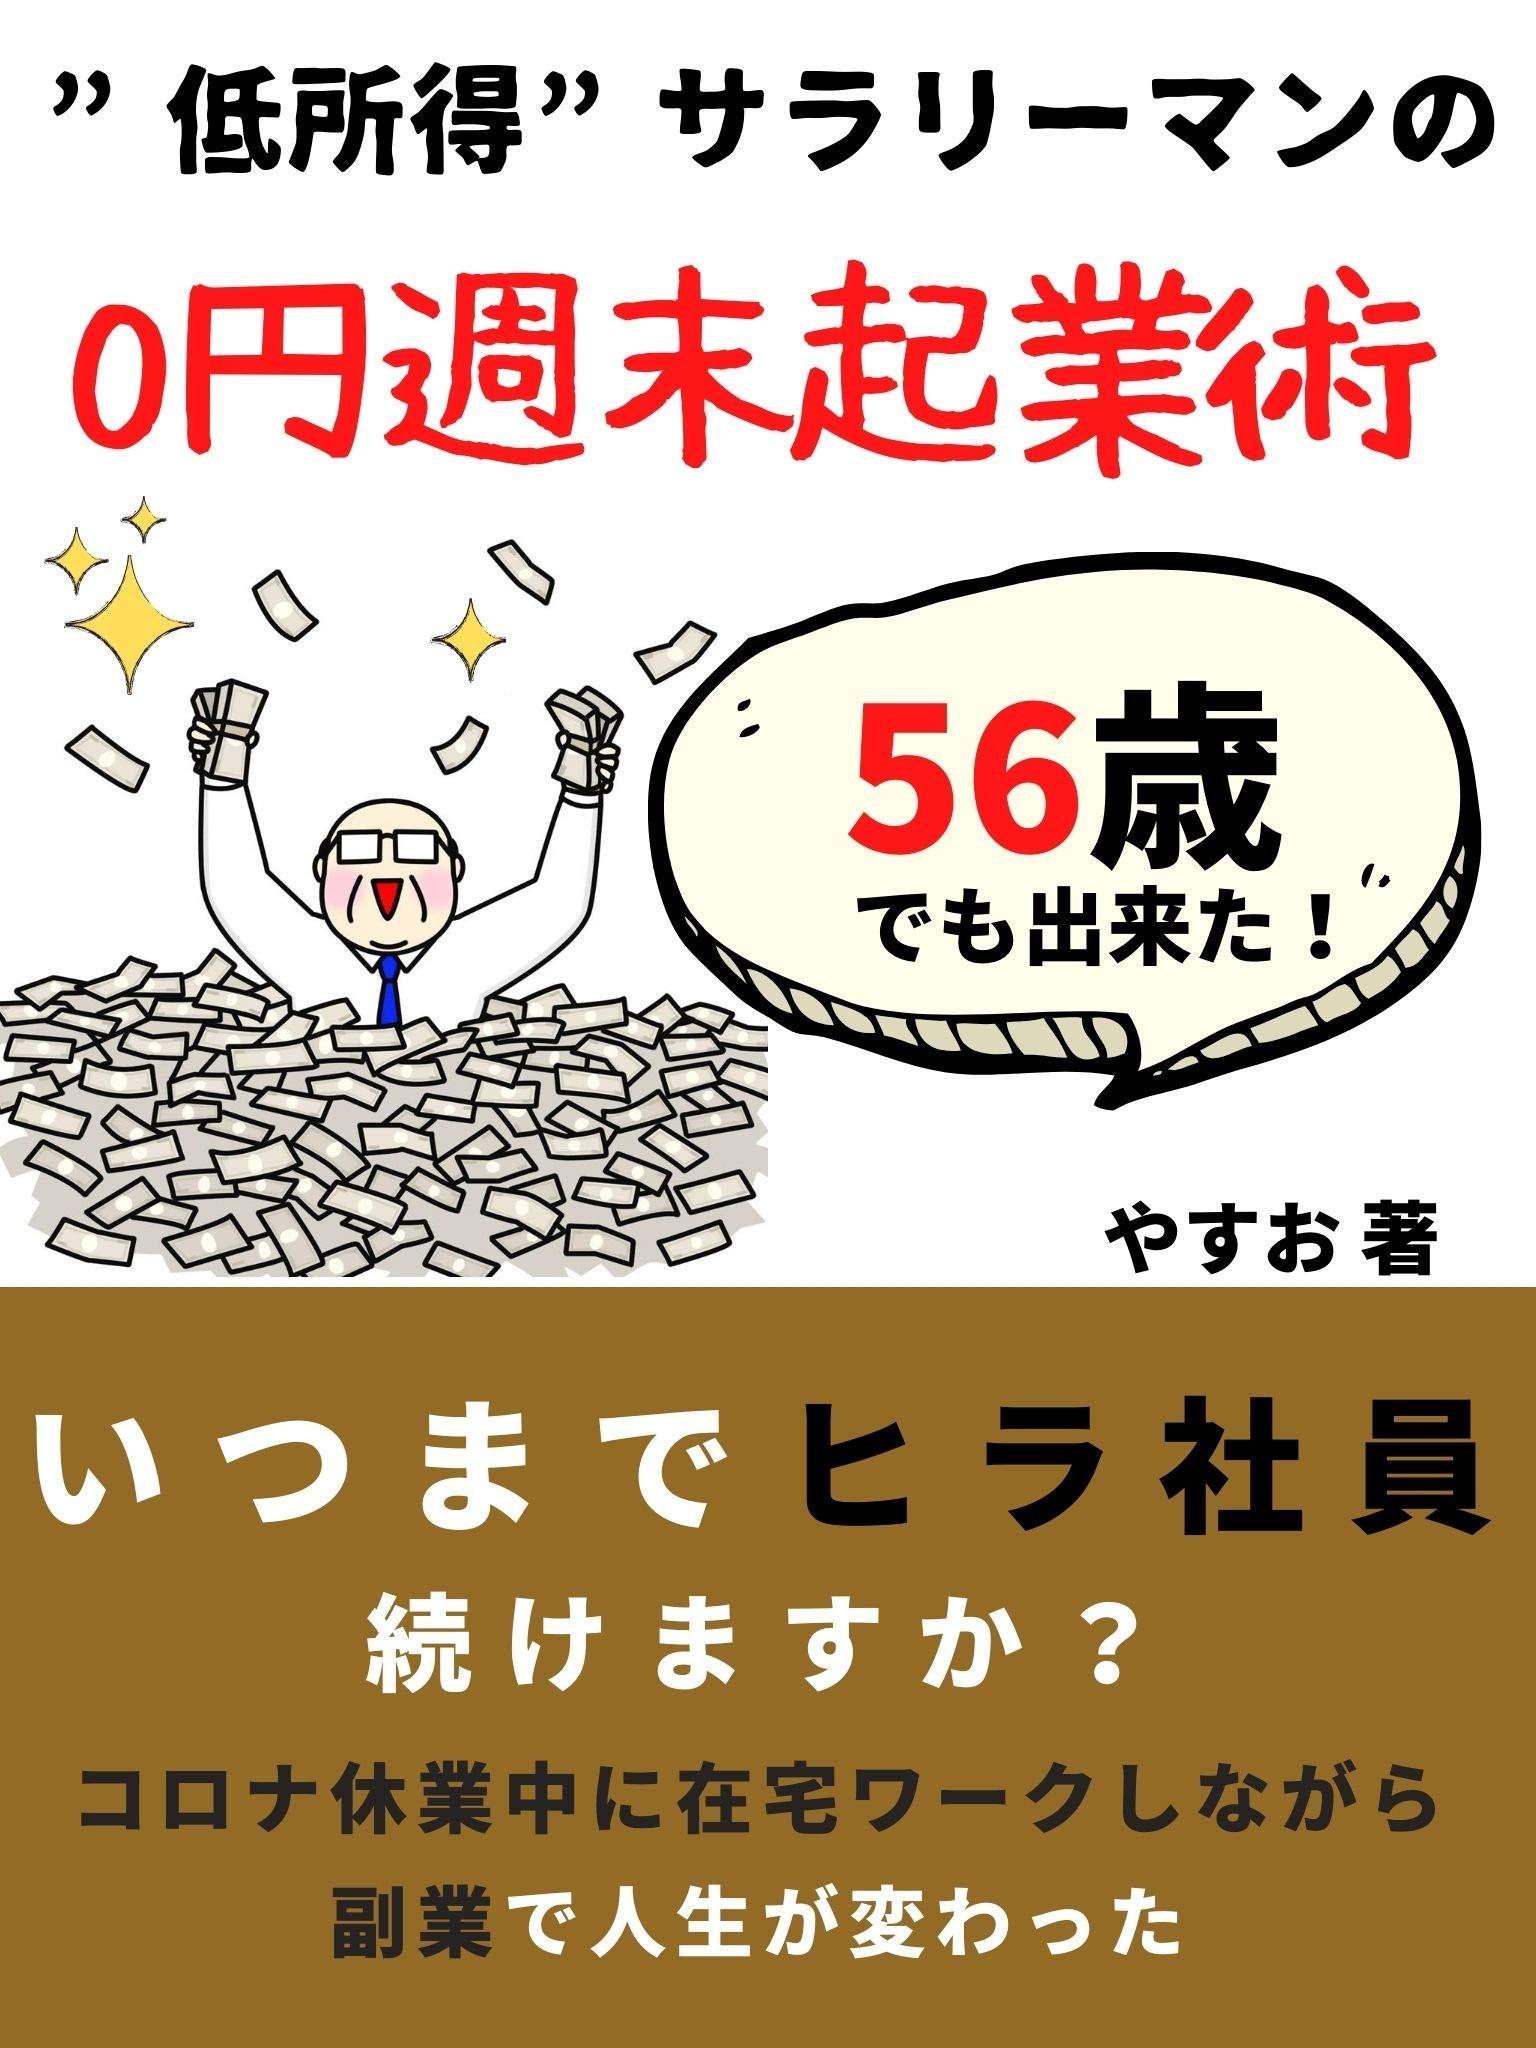 zeroensyuumatukigyouzyutu : itsumadehirasyaintudukemasuka (Japanese Edition)